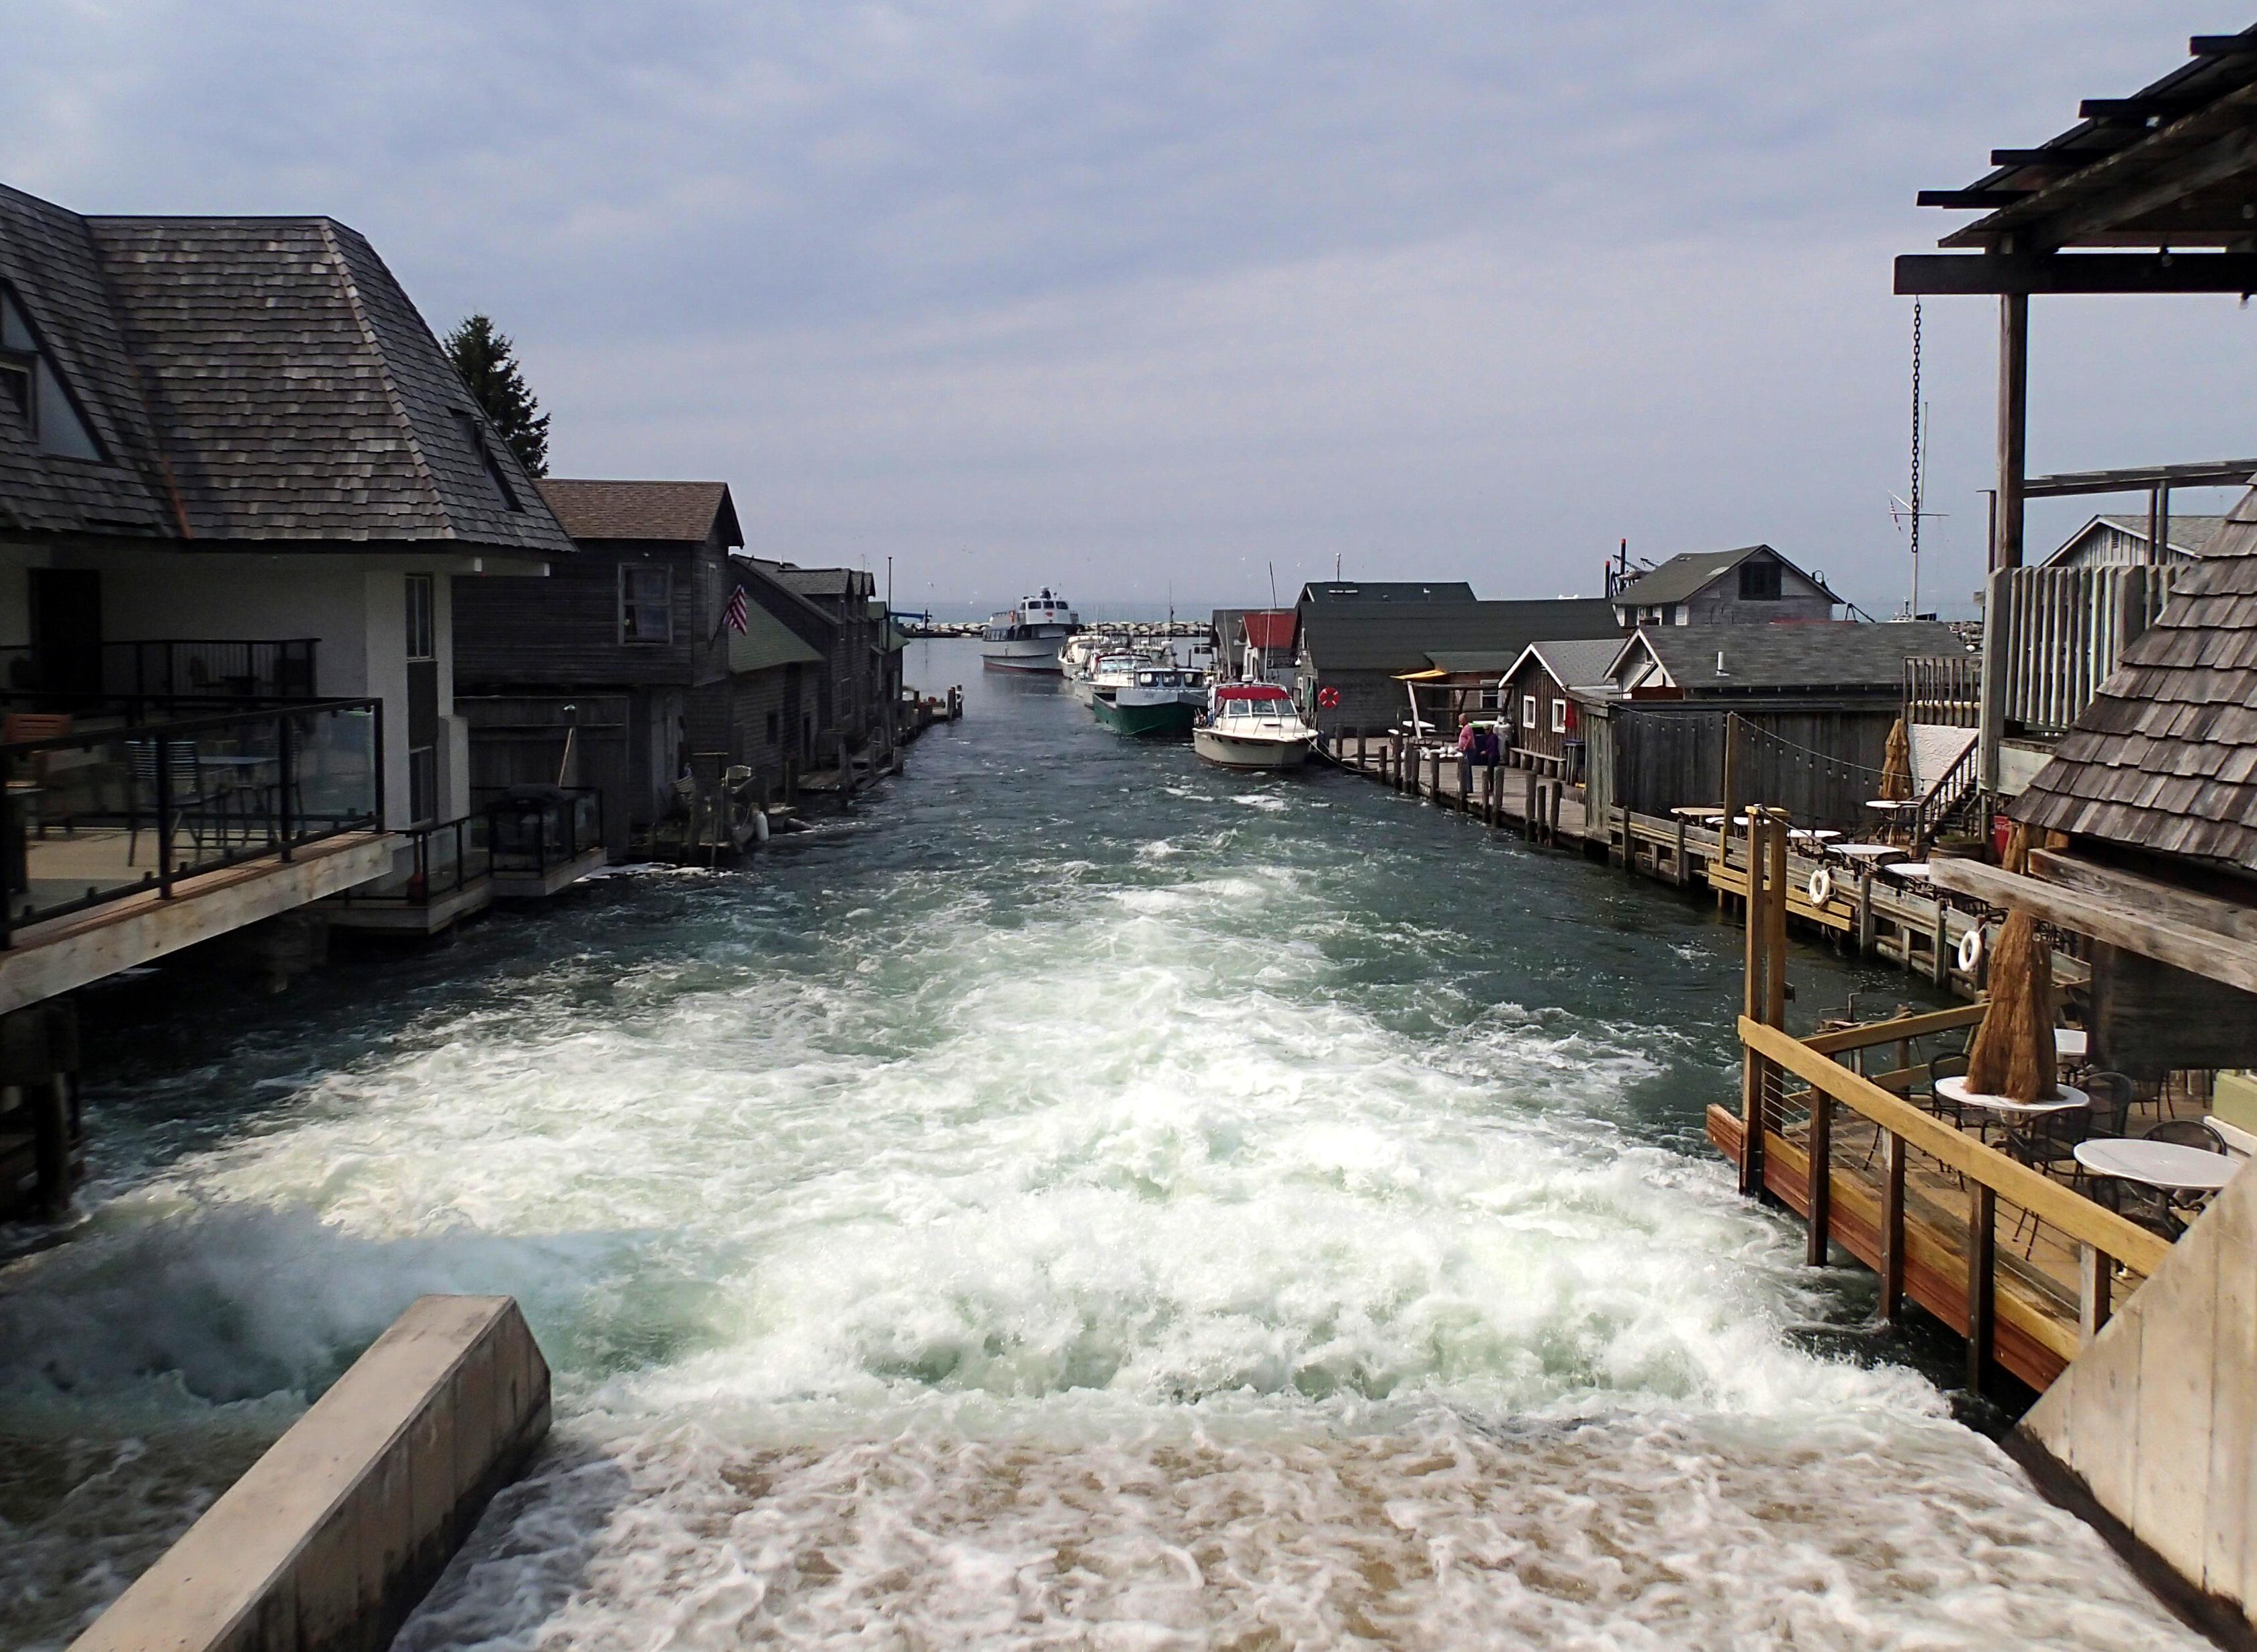 Michigan's historic Fishtown launches fundraiser as rising water threatens shanties